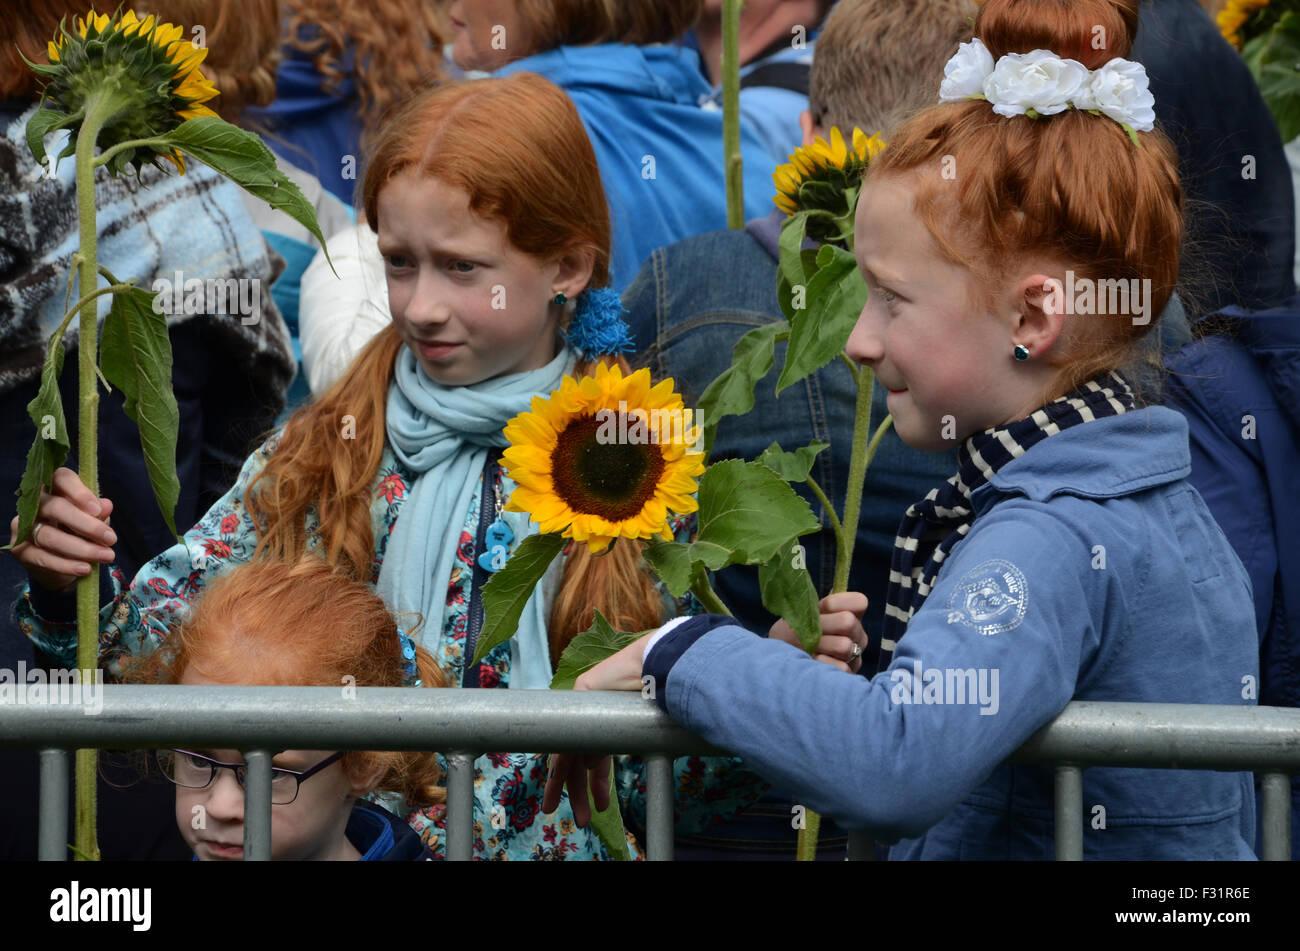 Impression of Redhead days 2015, Breda, Netherlands - Stock Image